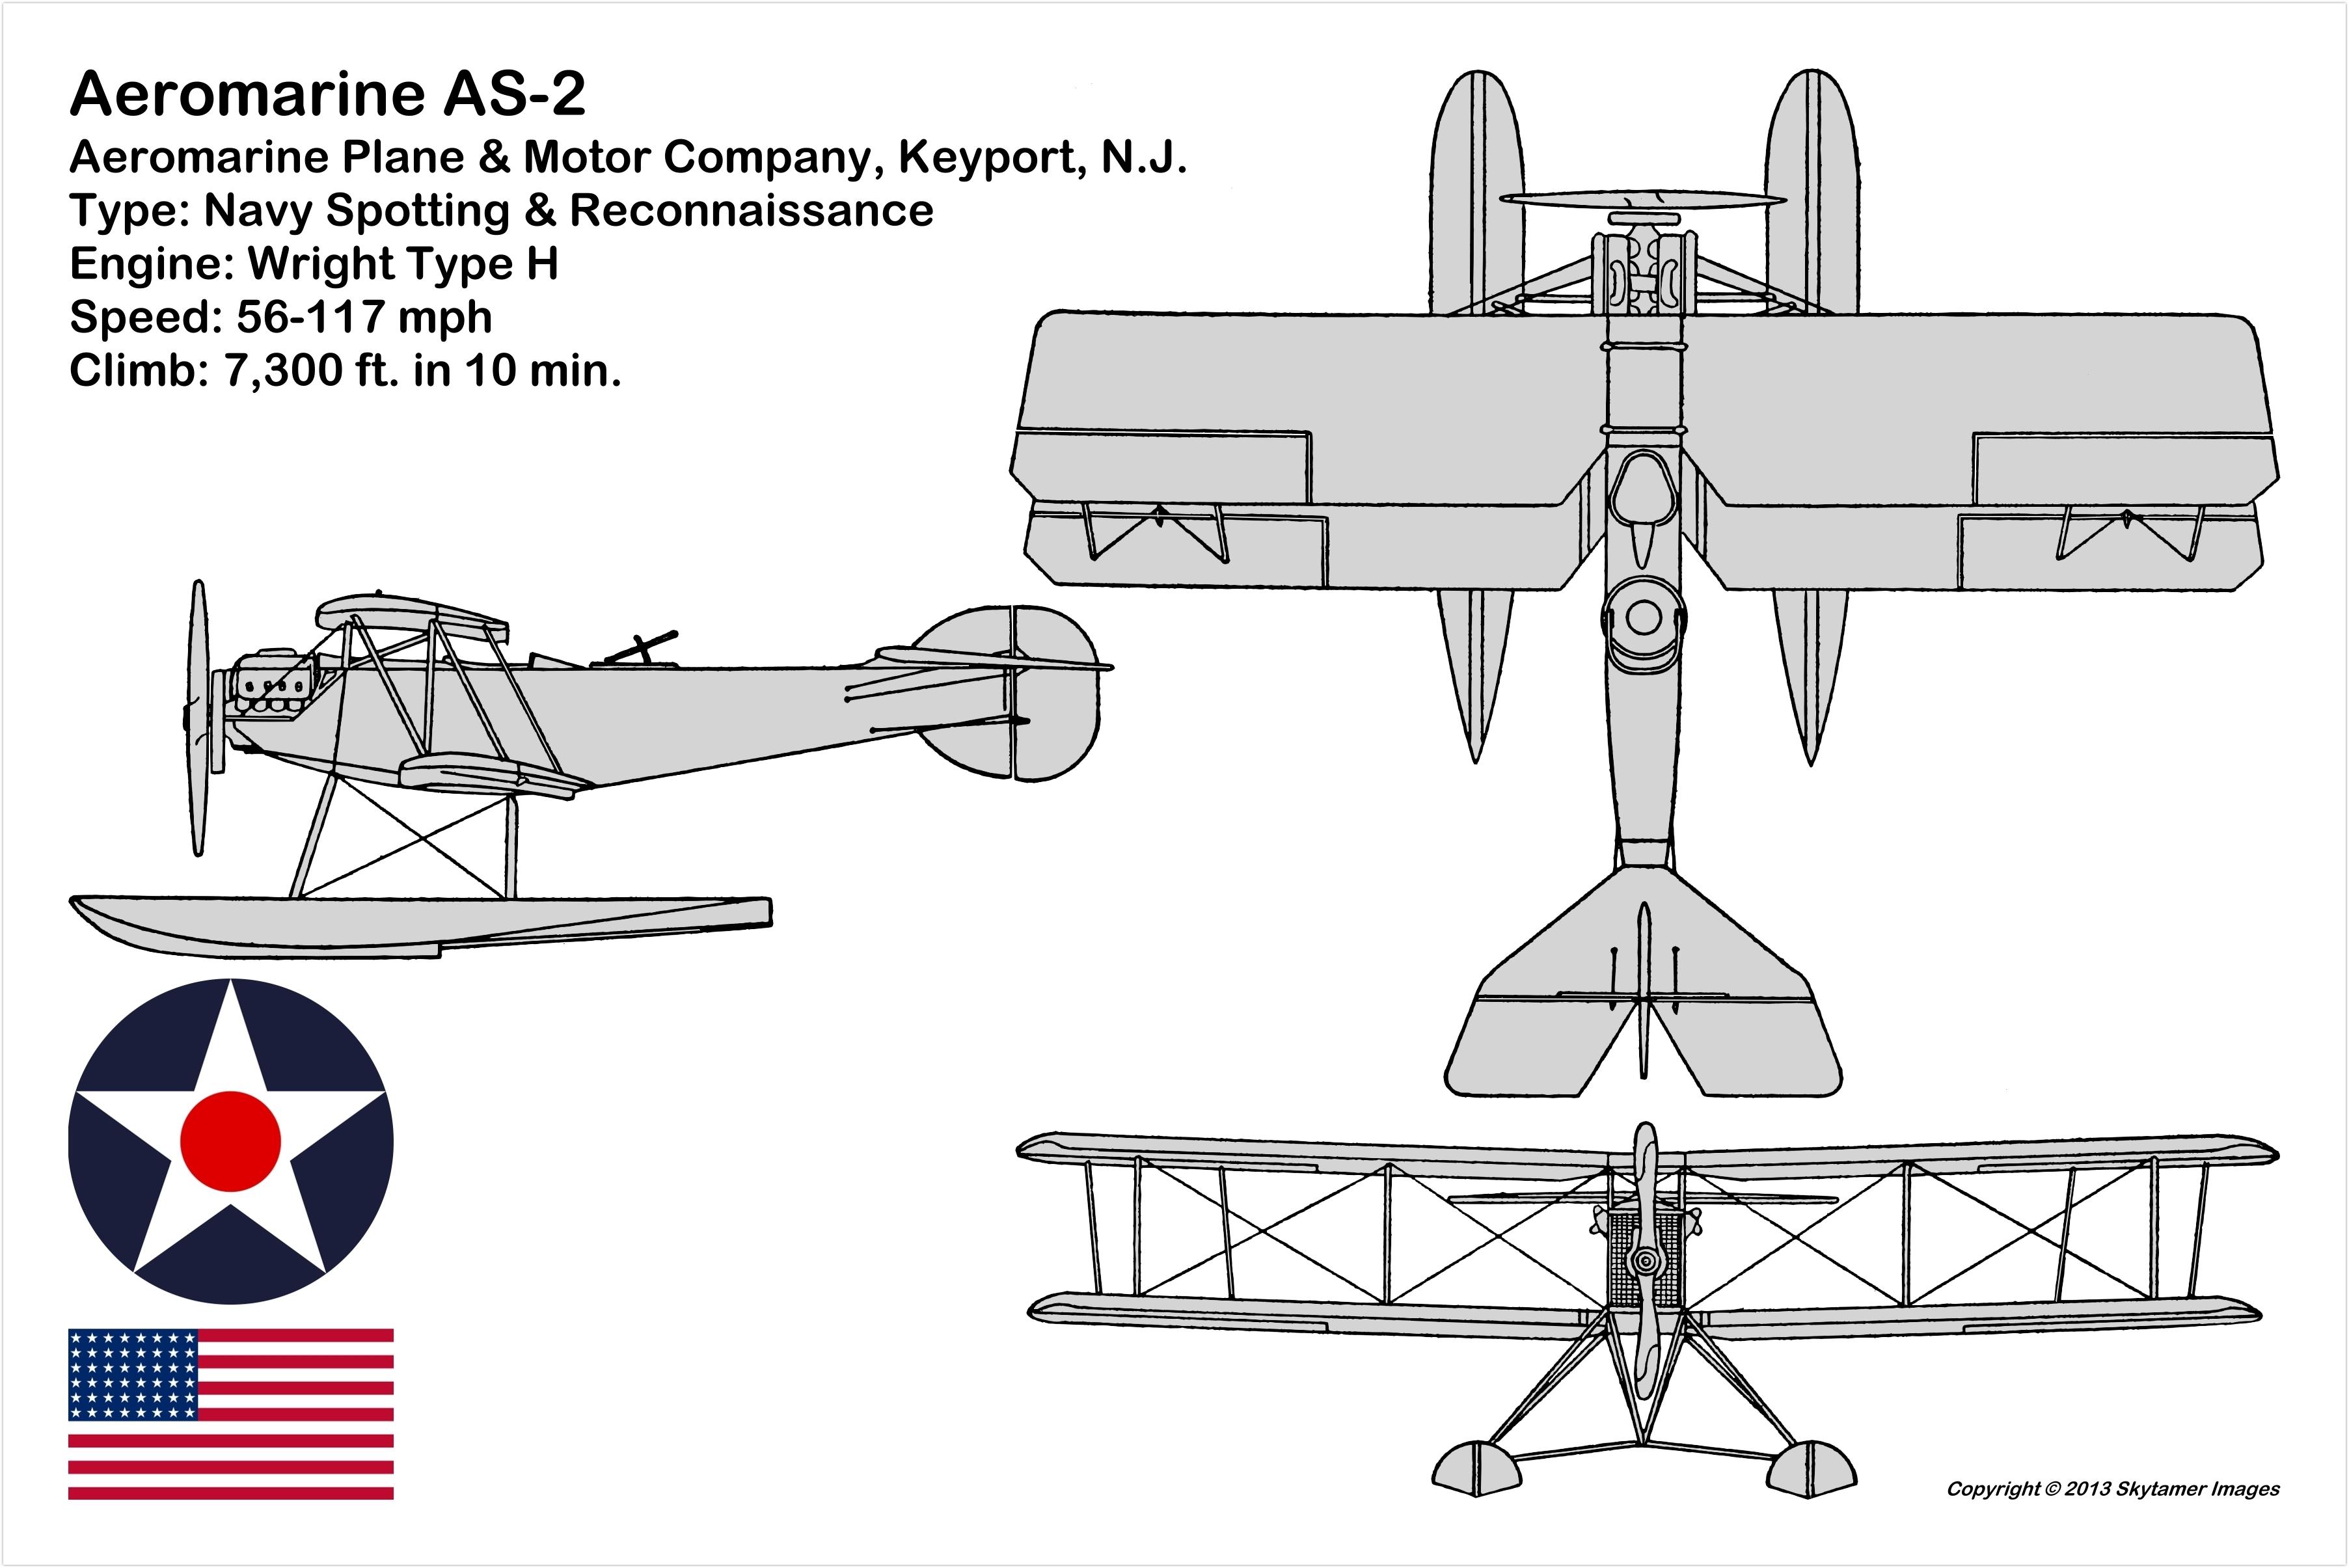 Aeromarine Aircraft